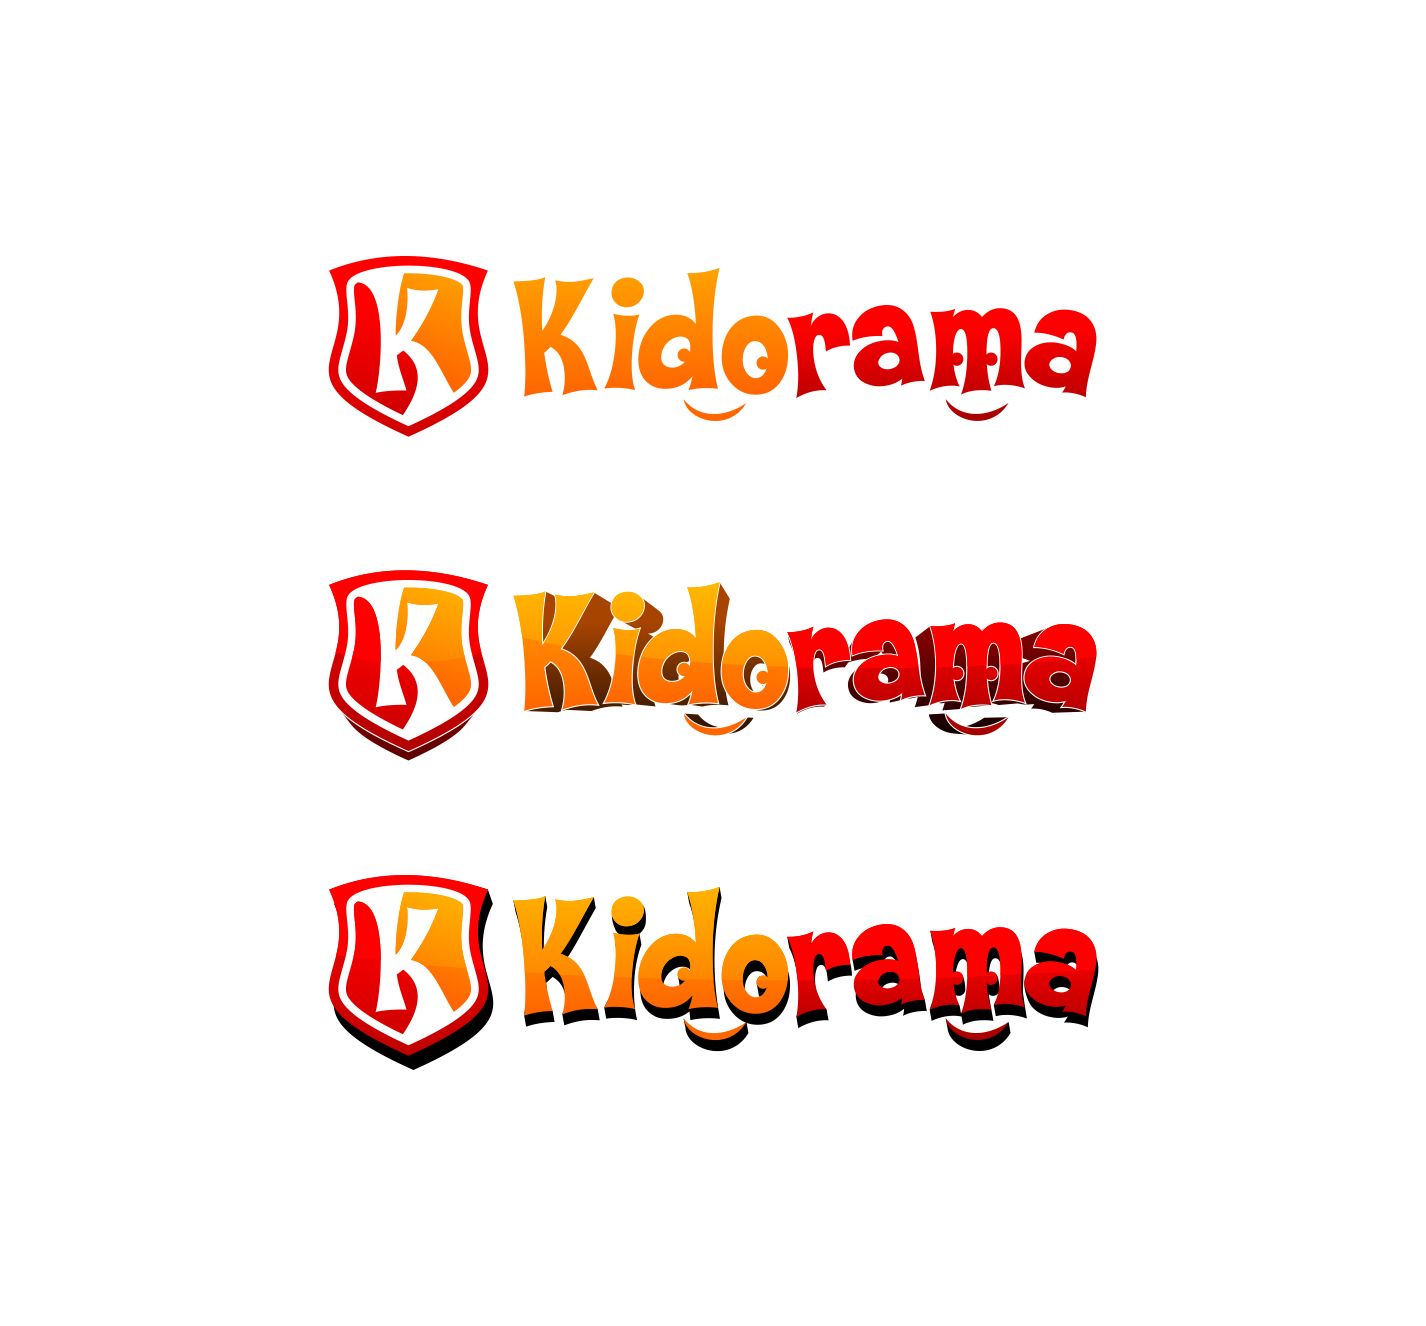 Create a winning logo design fo Kidorama - Kids city